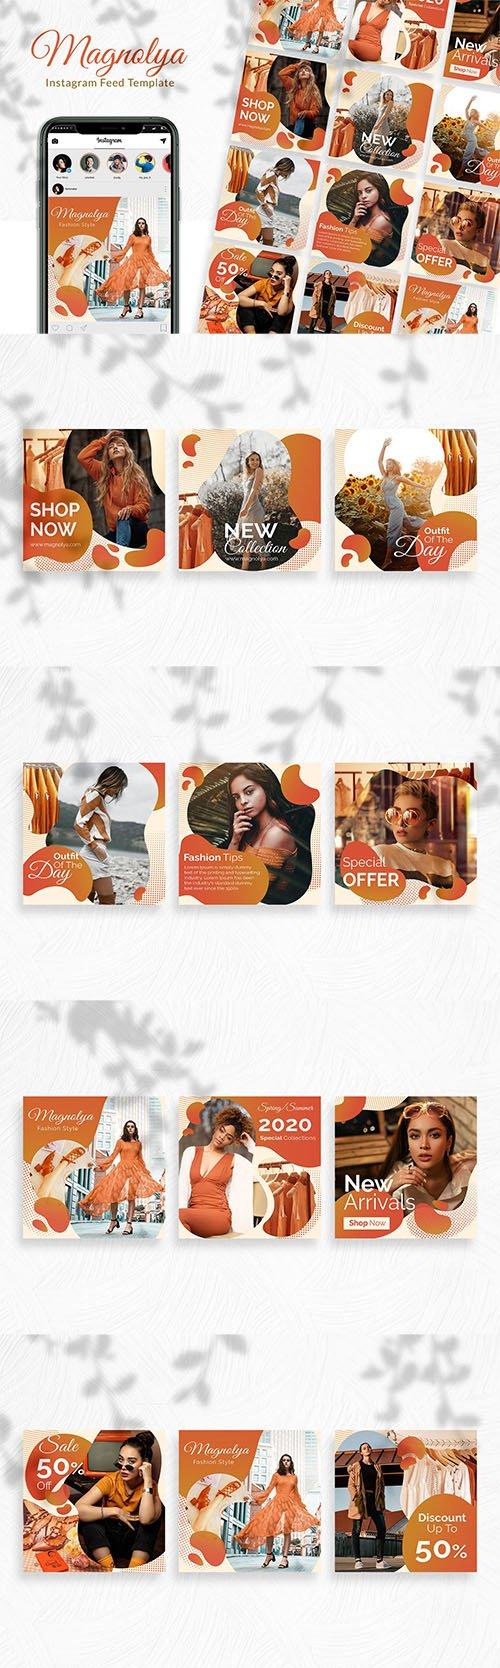 Magnolya Instagram Feed Template